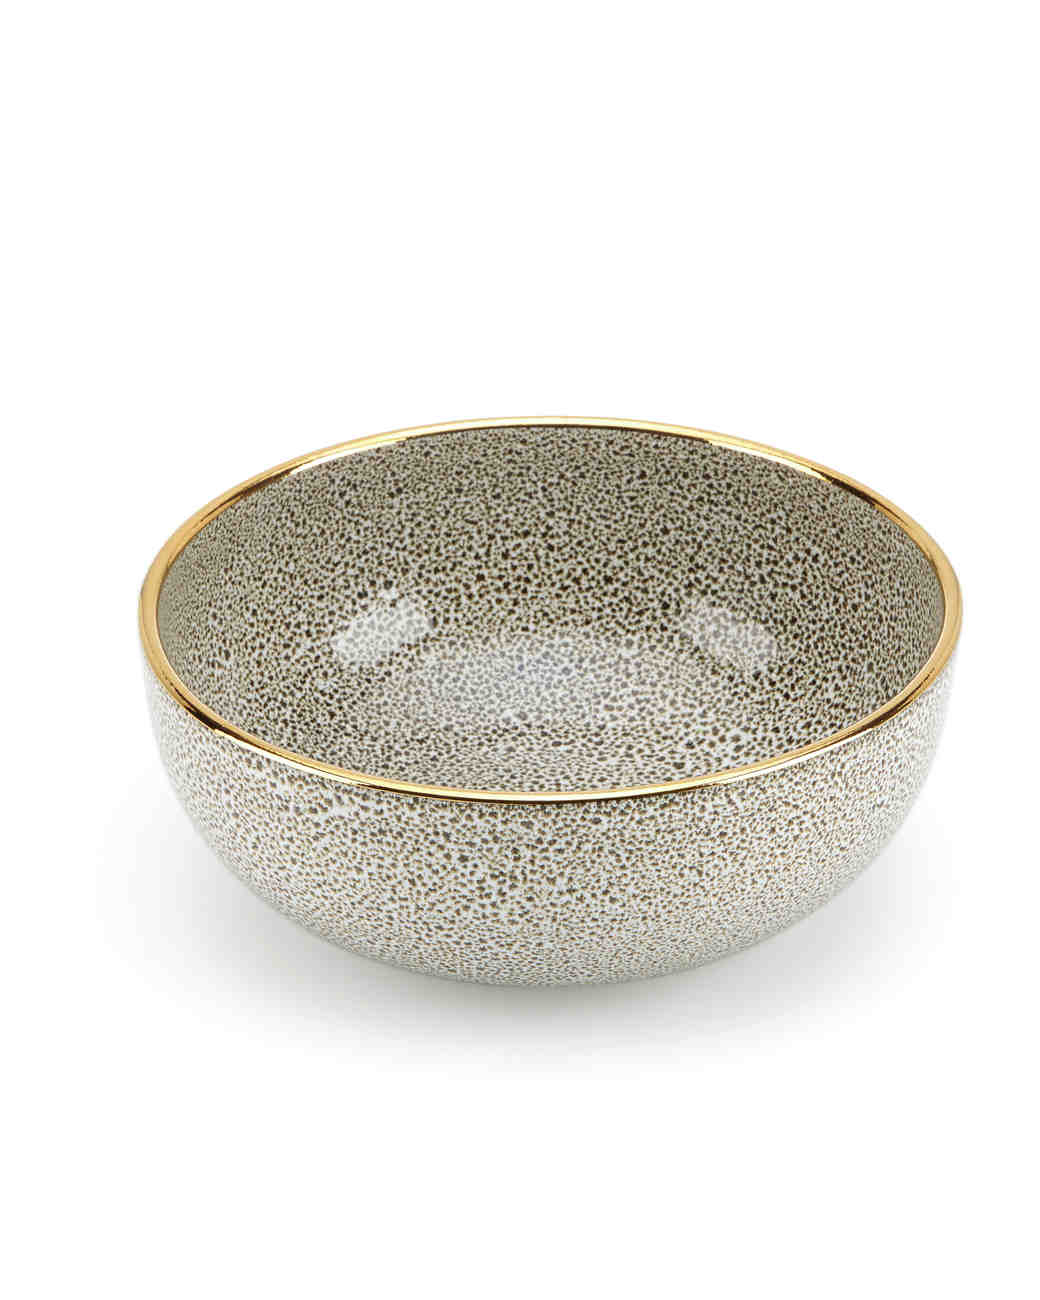 china-registry-luxe-michael-wainwright-panthera-bowl-1014.jpg